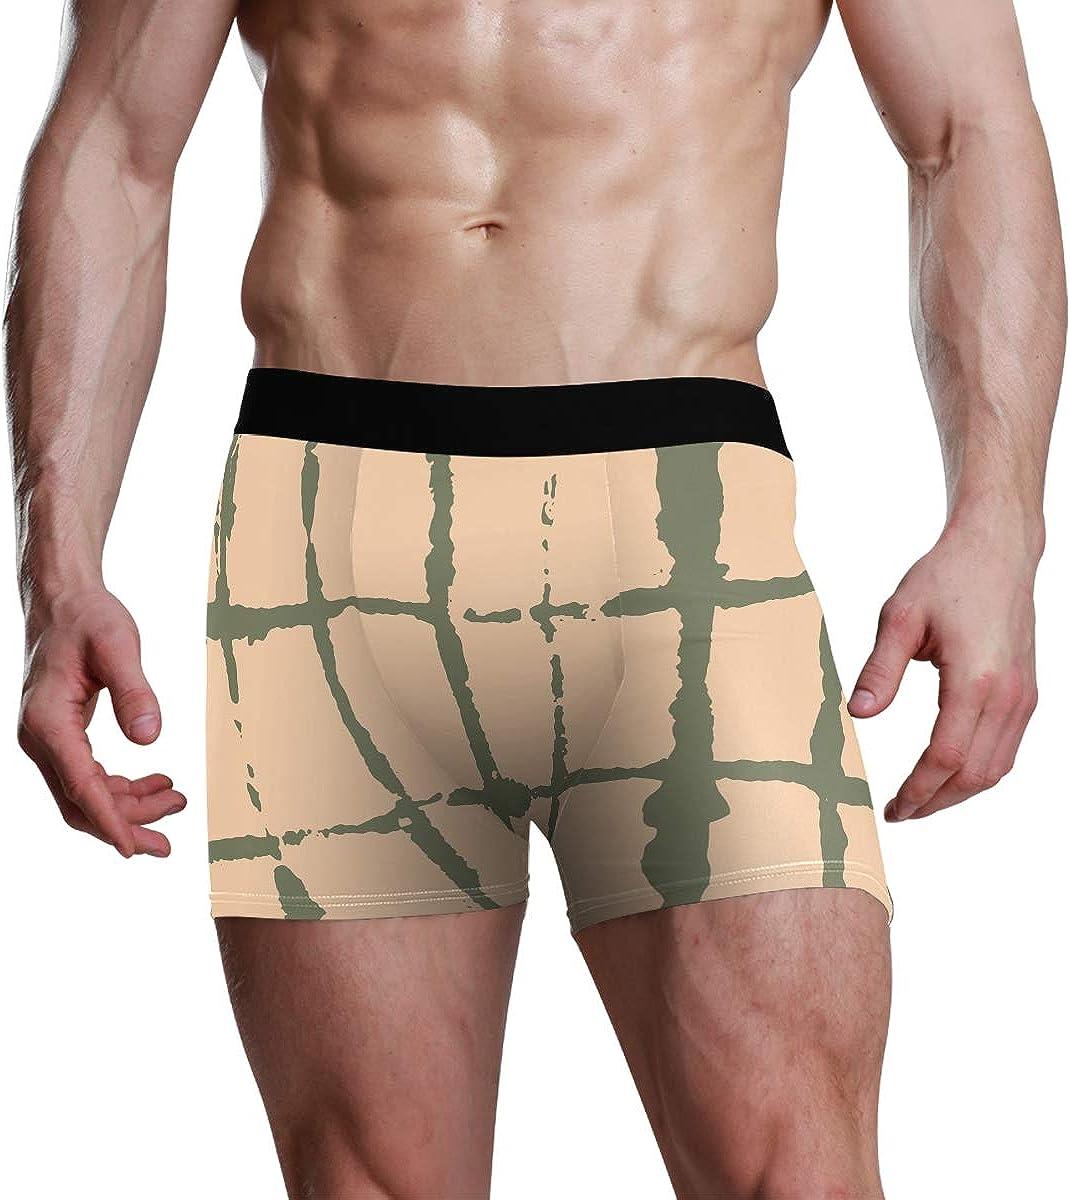 HangWang Mens Boxer Briefs Japanese Kimono Vector Seamless Pattern Low Rise Trunks Underwear Breathable Bikini Boys